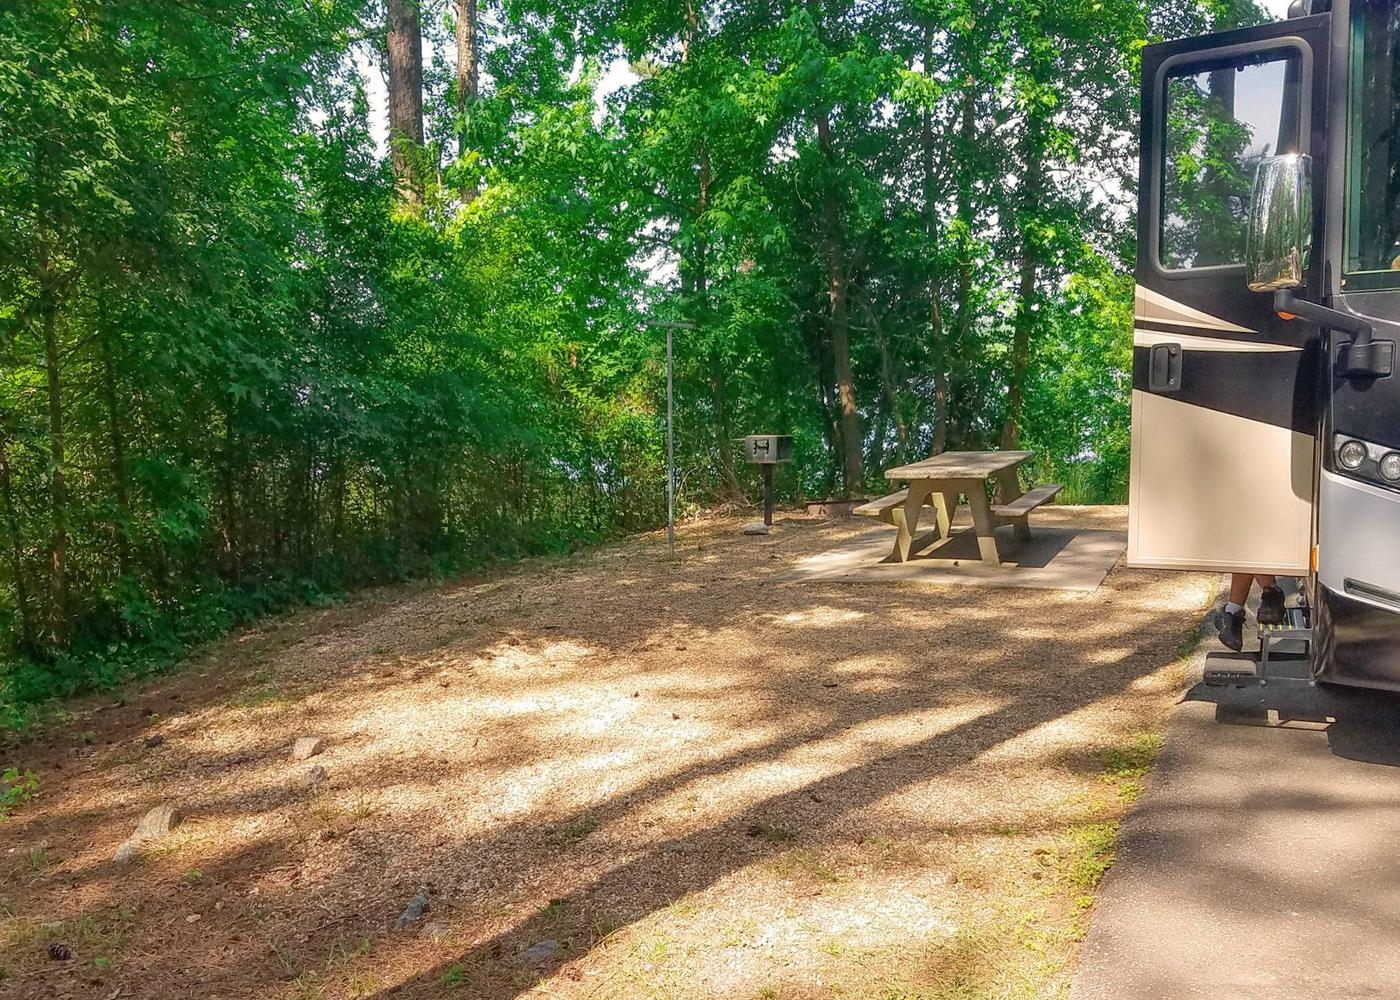 Campsite view.Victoria Campground, campsite 24.